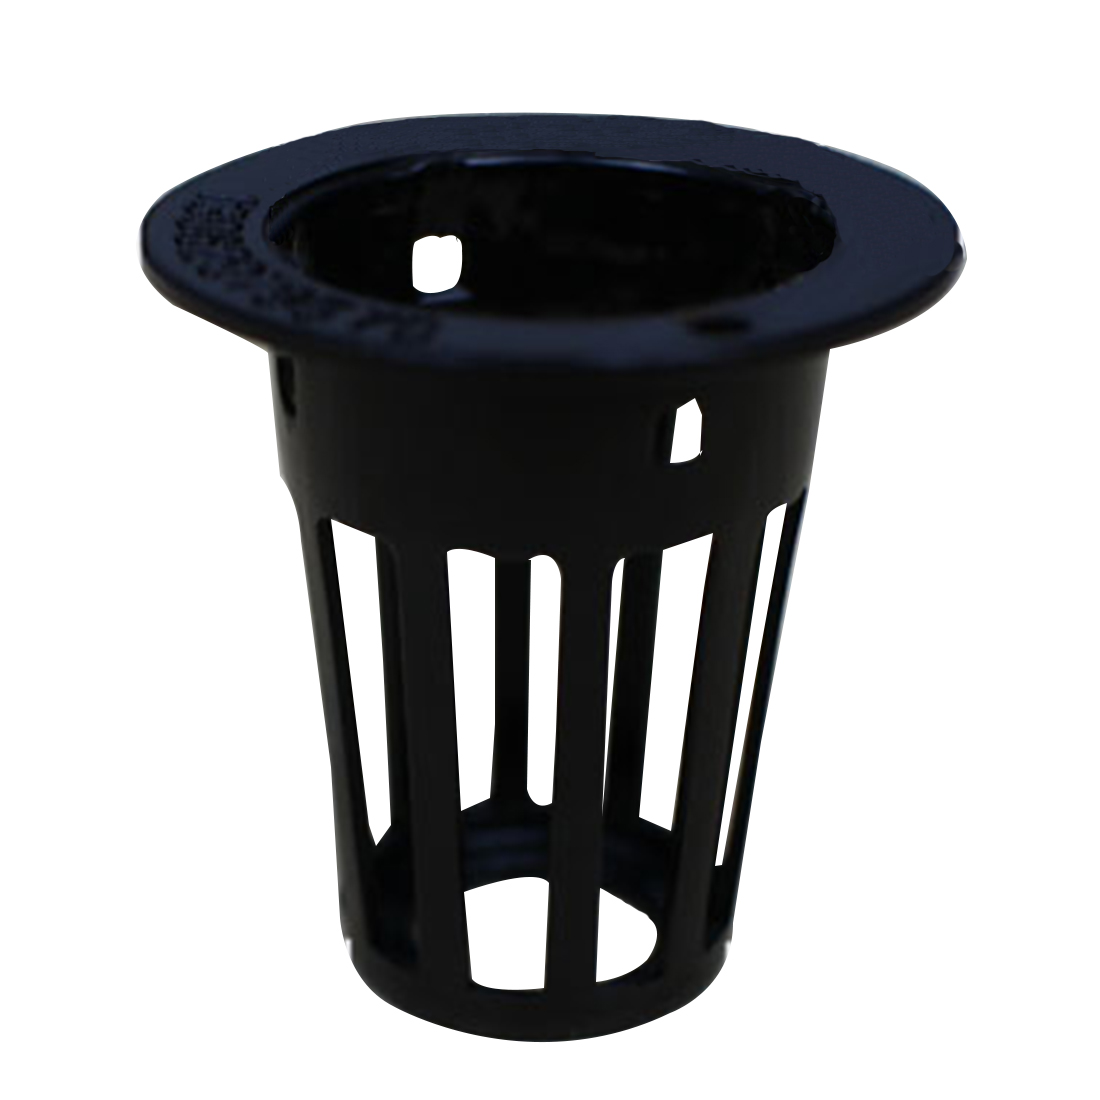 VICTMAX 10Pcs/set Garden Nursery Pots Water Soilless Culture Planting Basket Holder Hydroponic Mesh Net Pot Basket